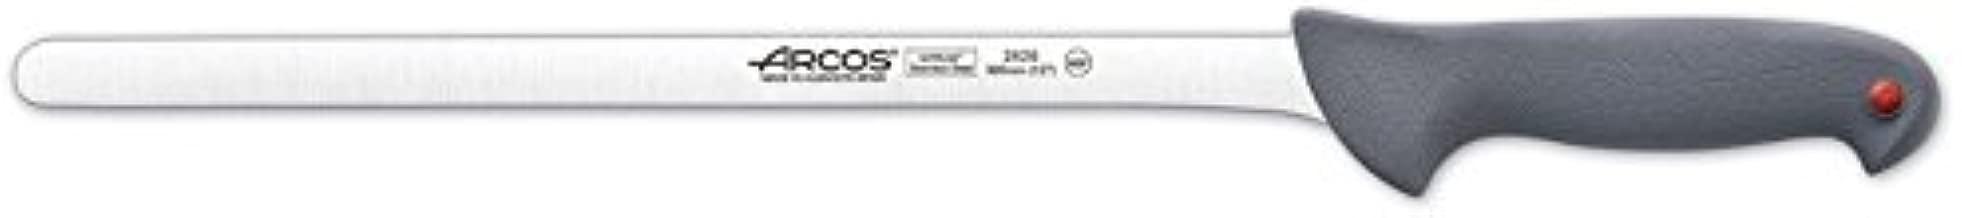 Arcos 12-Inch 300 mm Colour-Prof Flexible Ham Knife